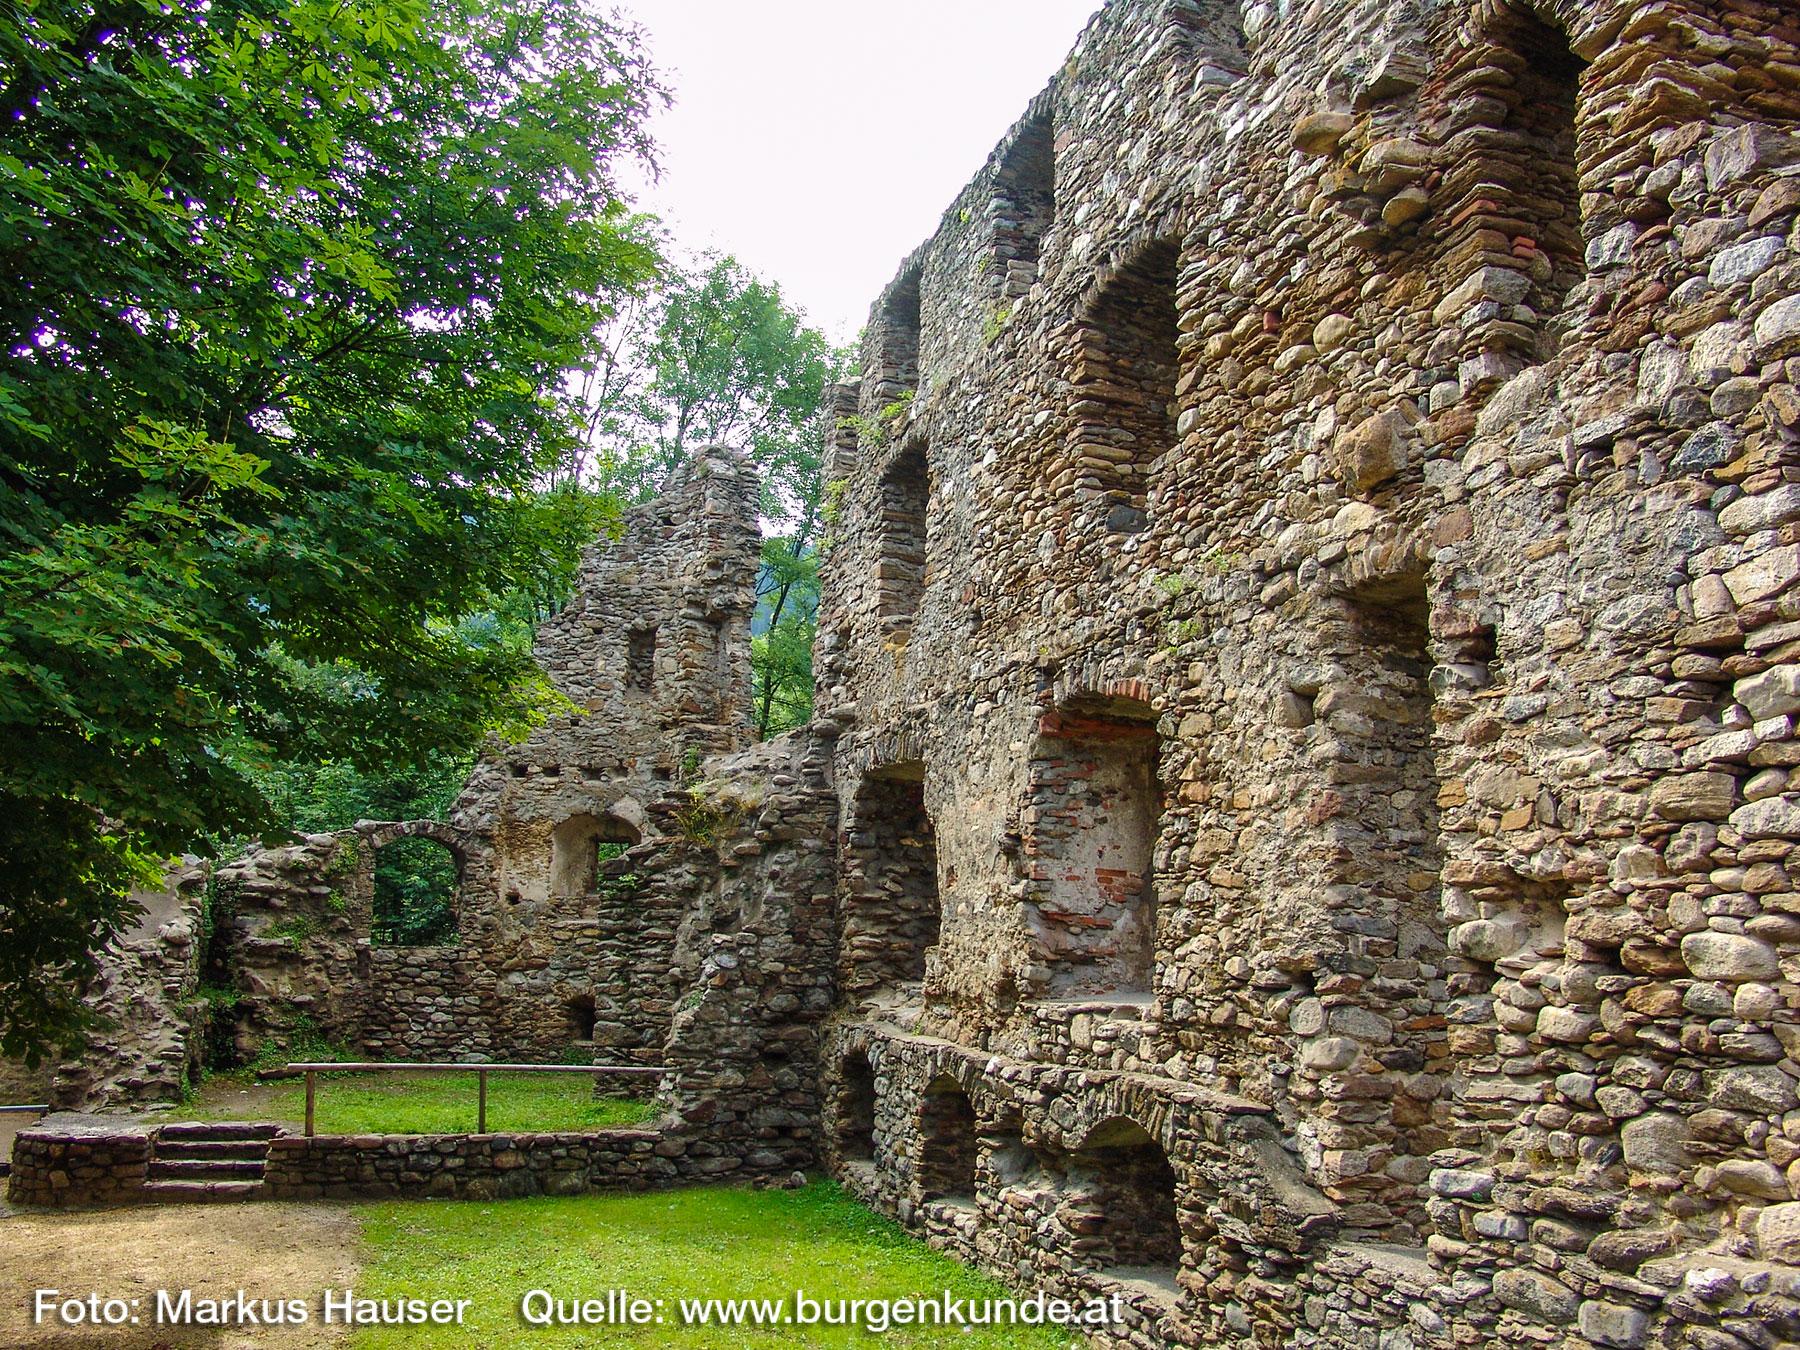 Burgruine-Gomarn-Bad-St-Leonhard-Kaernten-025